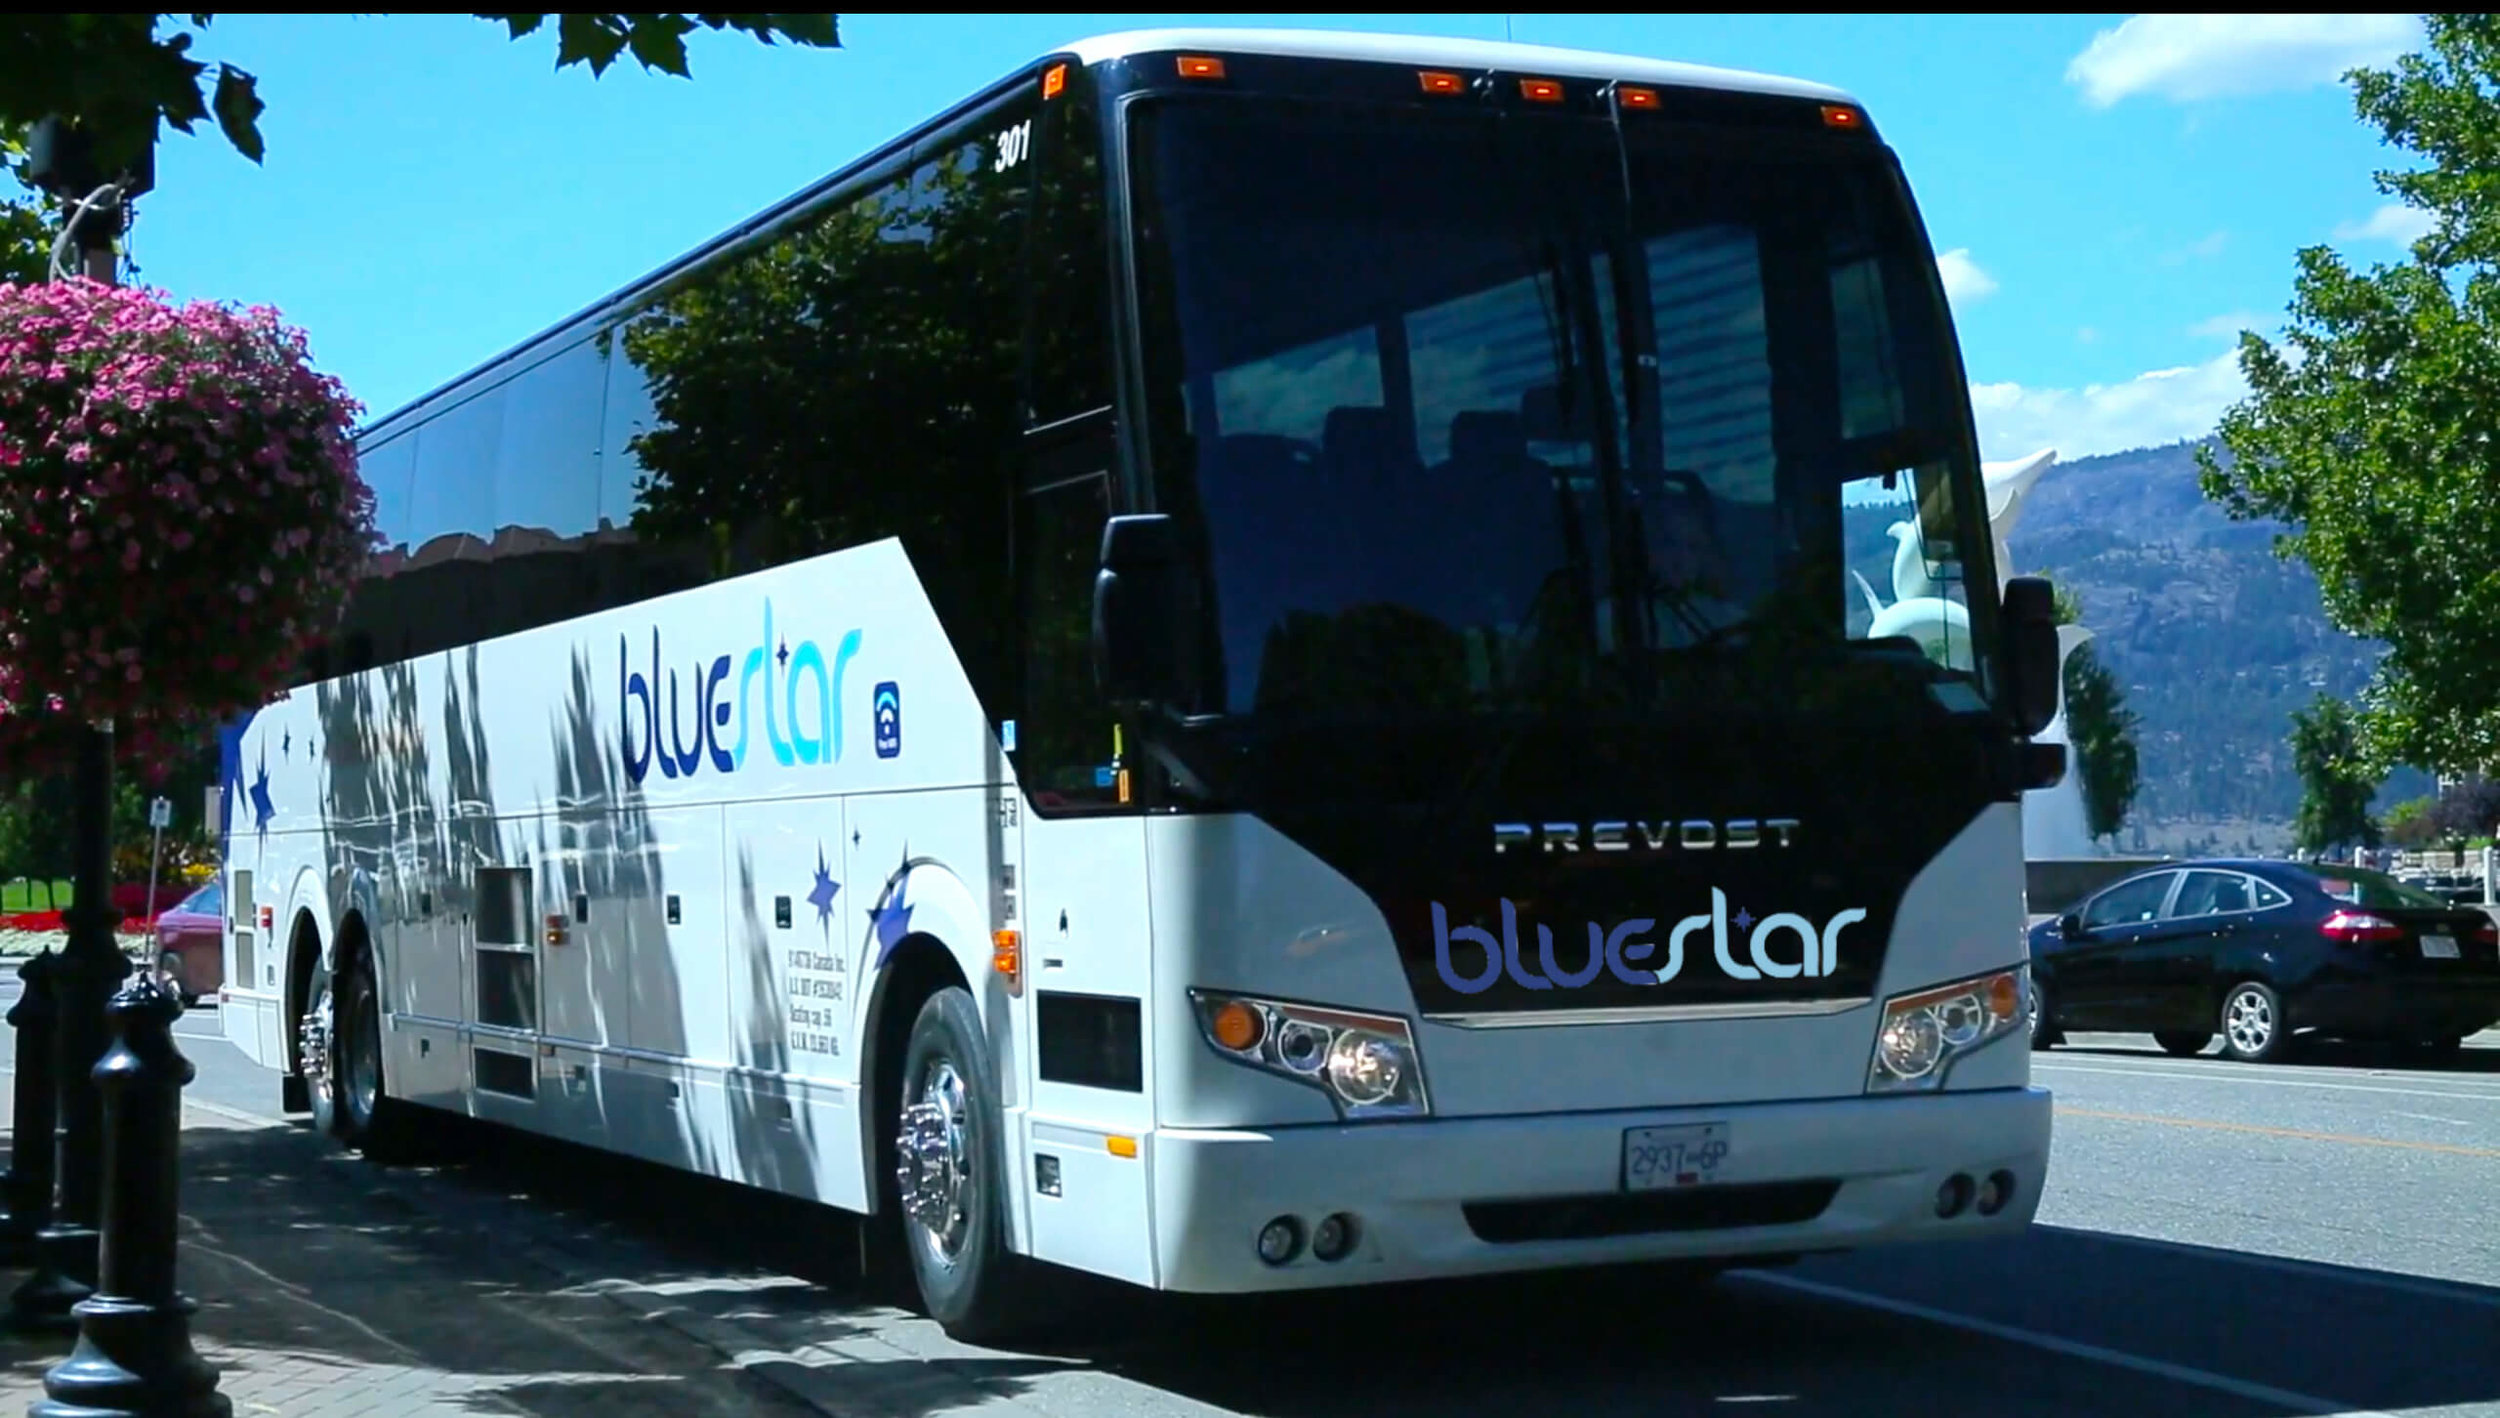 Bluestar Coachlines